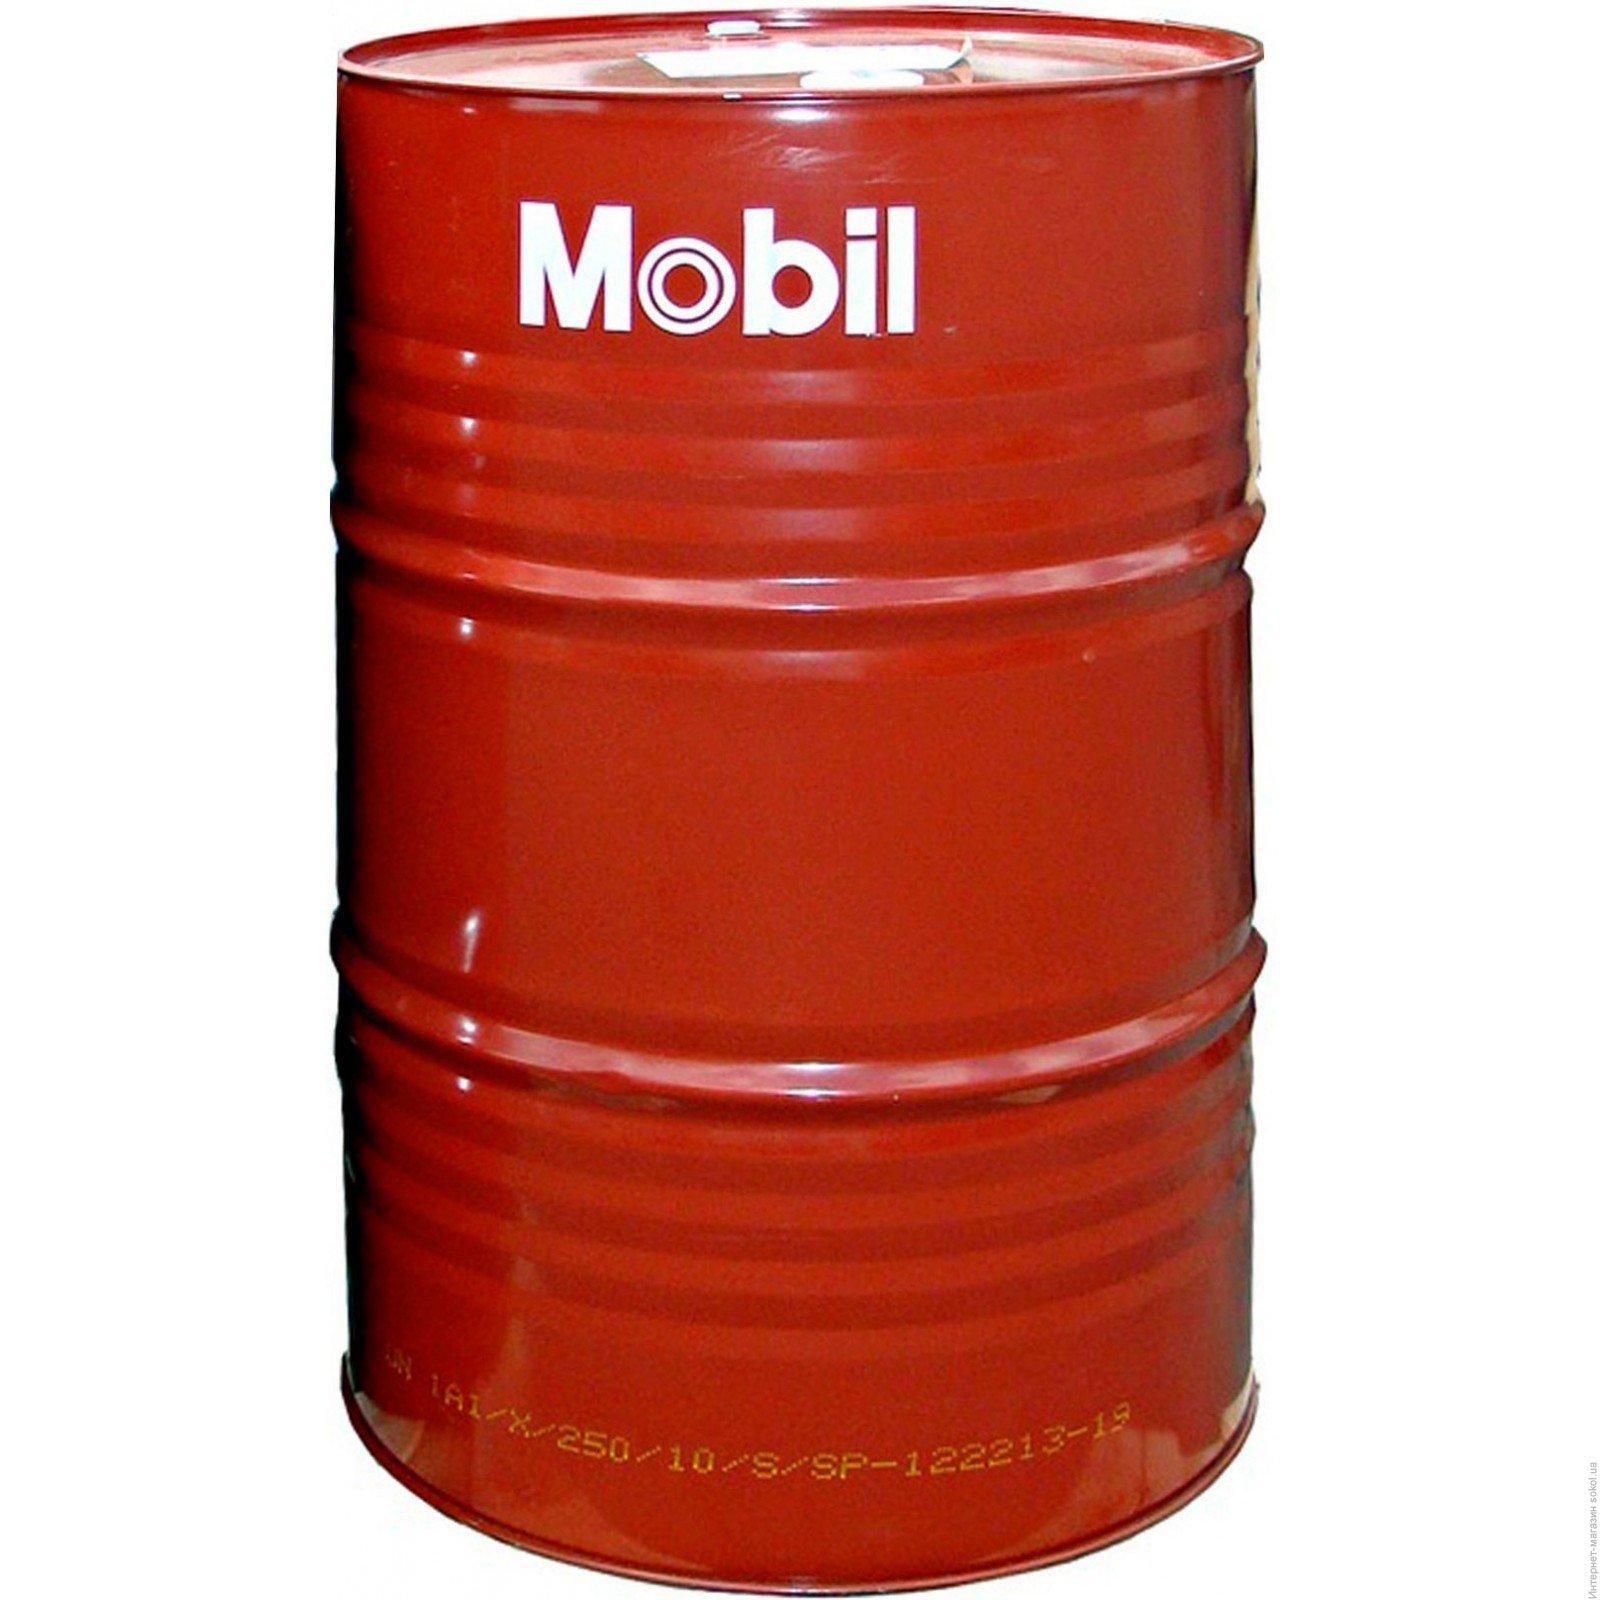 Mobil 1 Advanced Fuel Economy 0W-20 синтетическое моторное масло